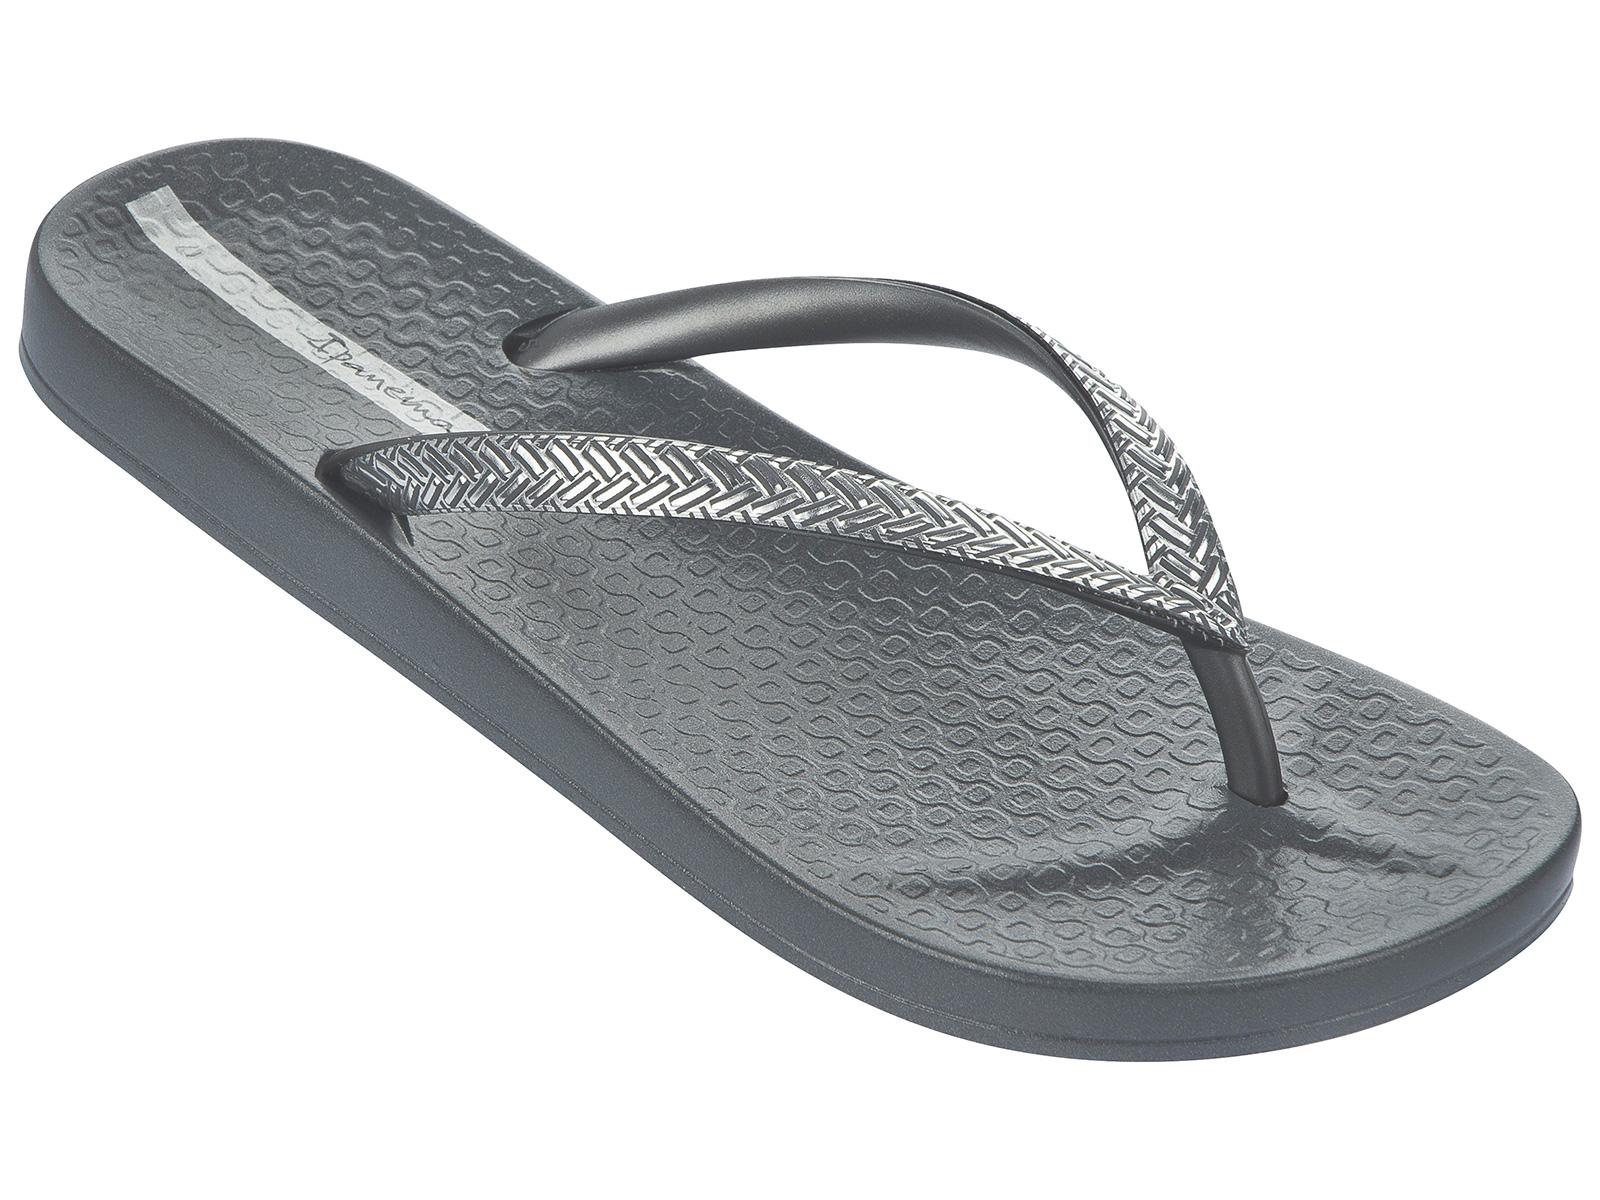 ea48701a787d Flip-Flops Flip-flops - Ipanema Mesh Fem Grey silver - Brand Ipanema